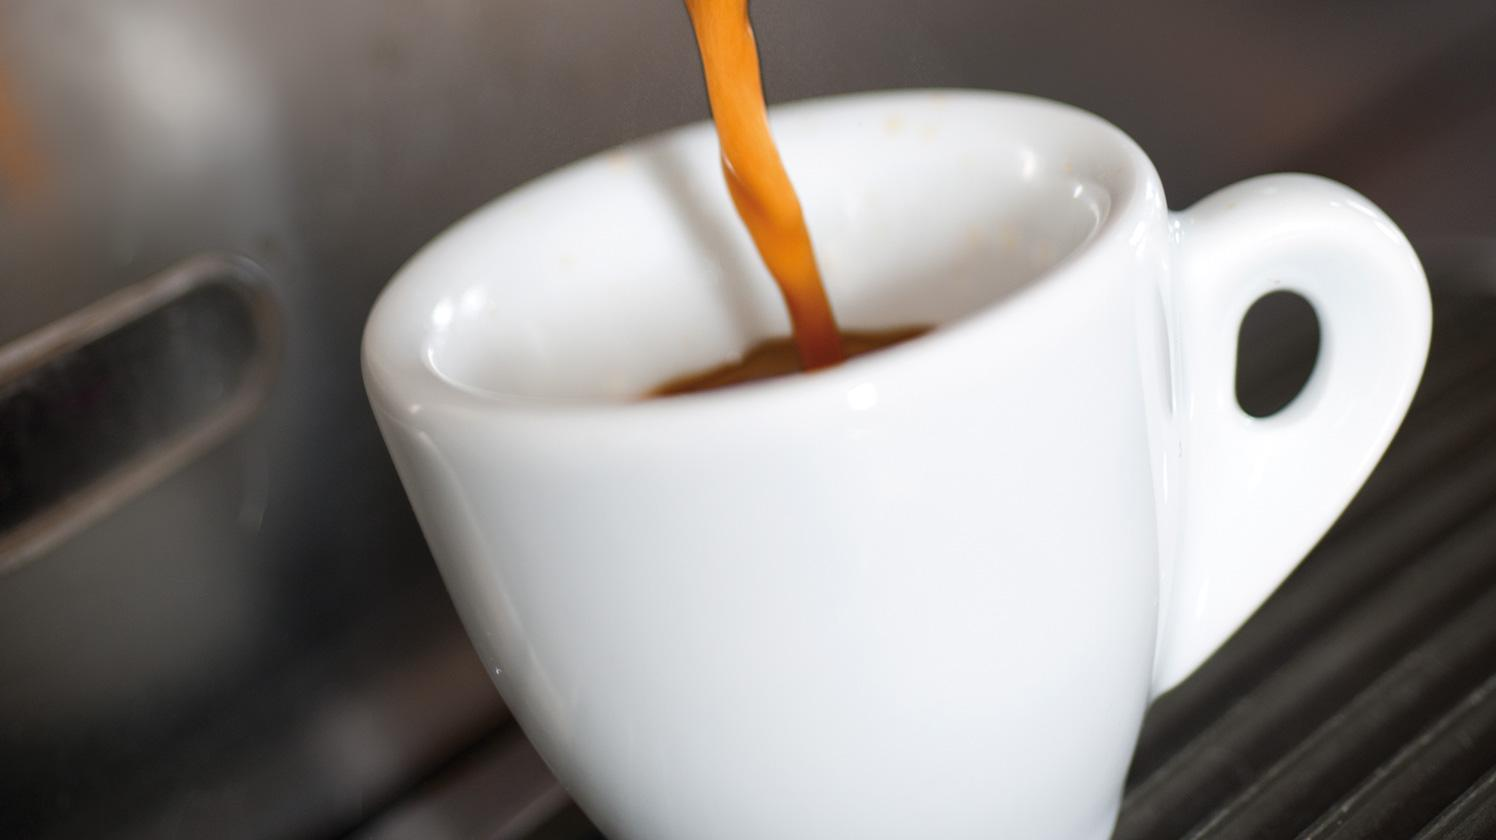 Filtr BRITA PURITY Fresh C50 kawa zbliżenie